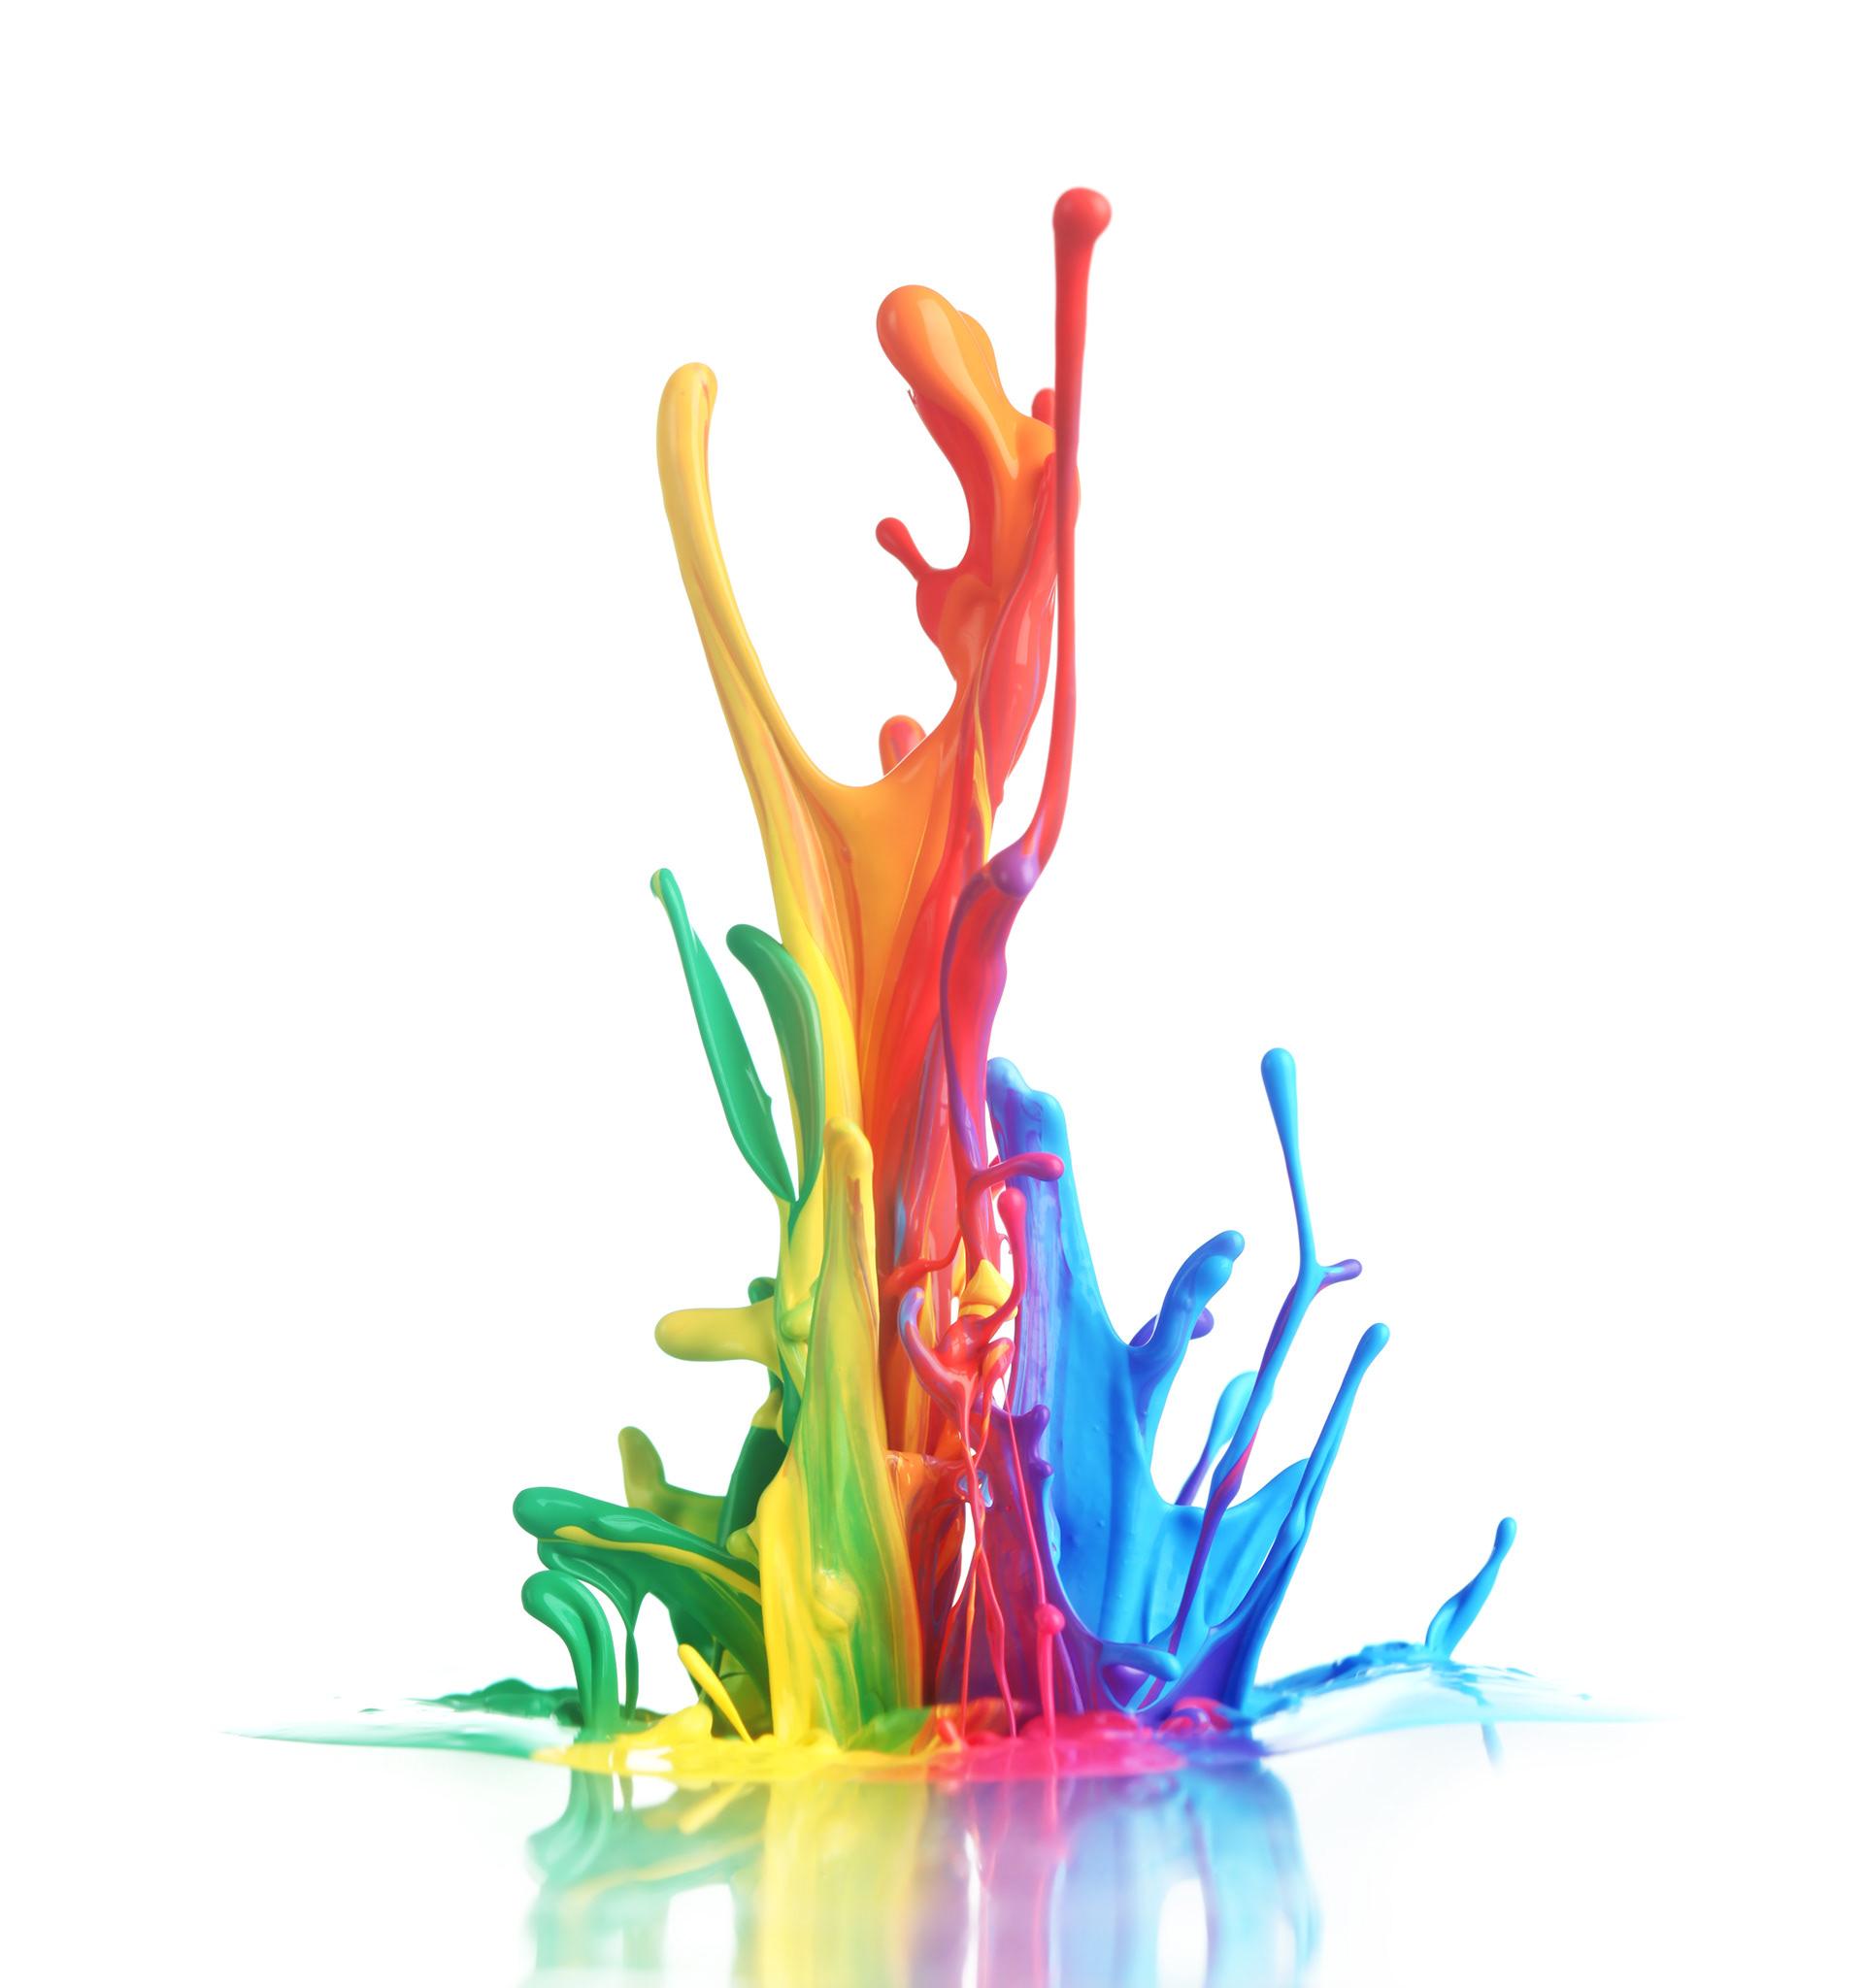 خلاقيت و ایده پروری